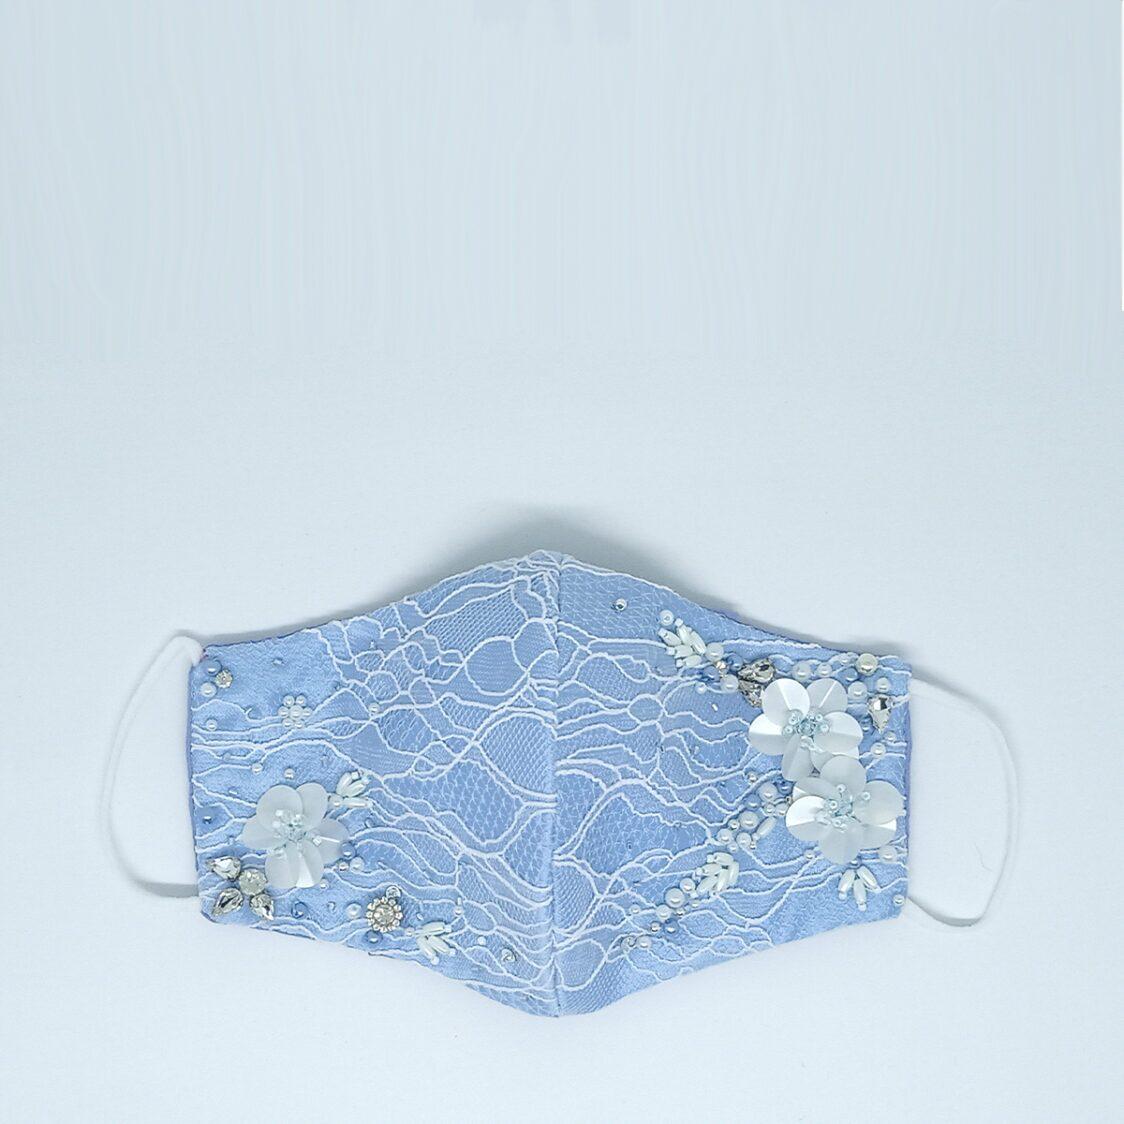 Gayatri Mask - Lace Beads Blue